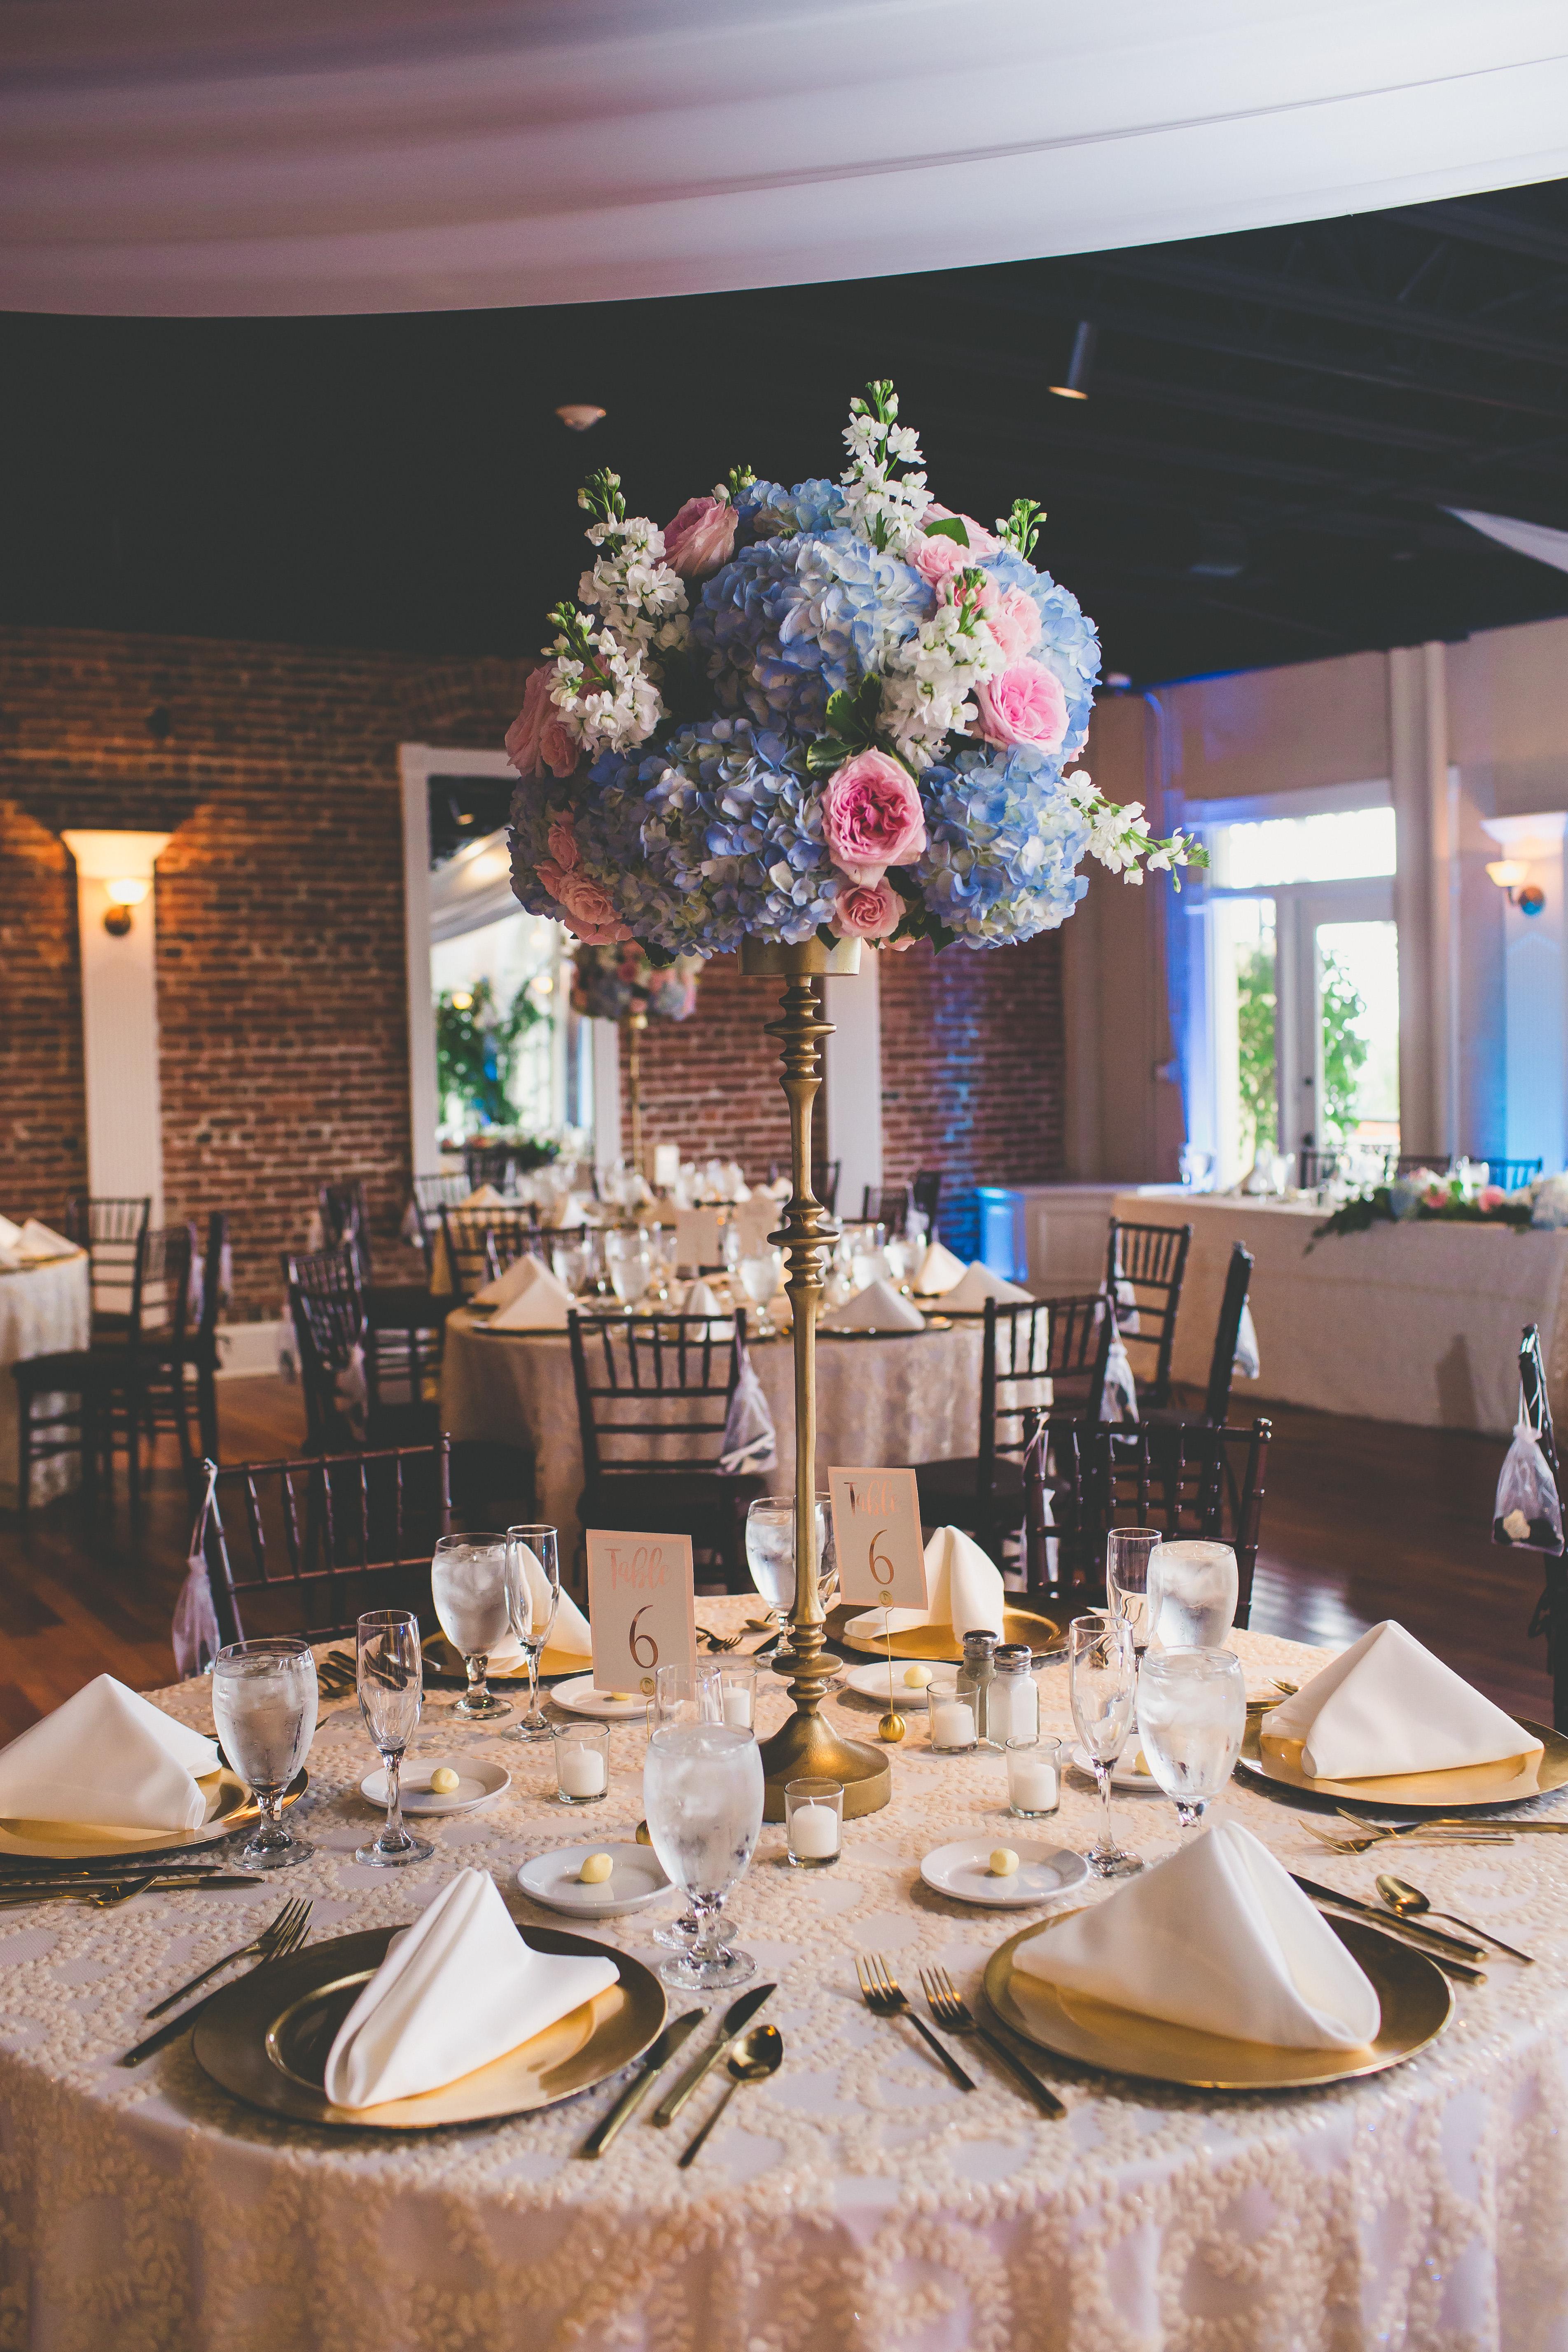 St. Augustine Wedding at The White Room's Villa Blanca ...